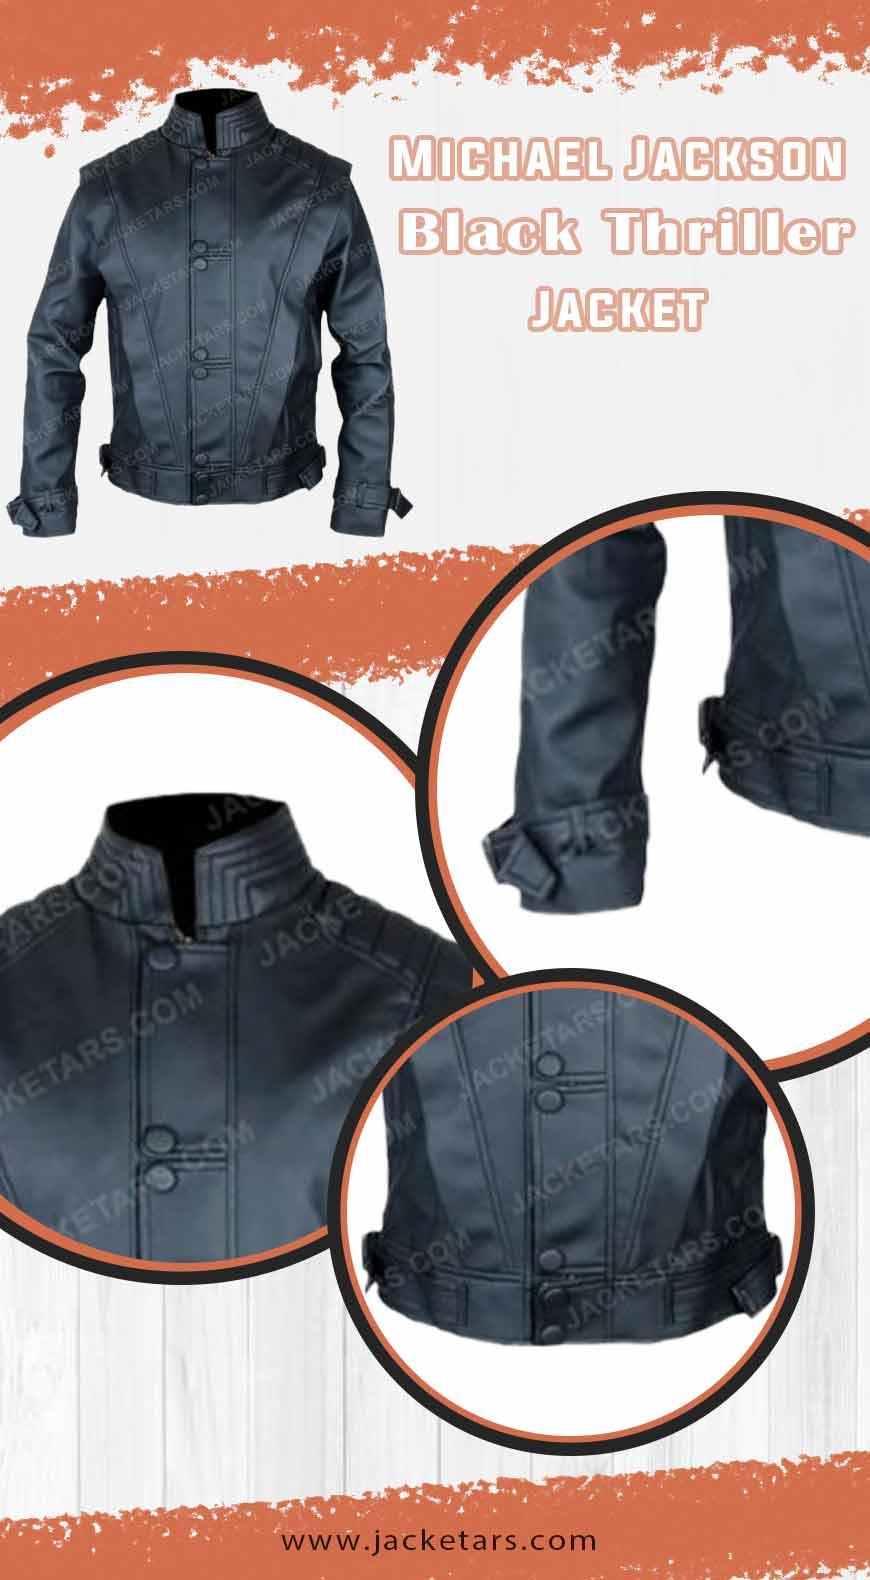 Michael Jackson Black Thriller Jacket INFO